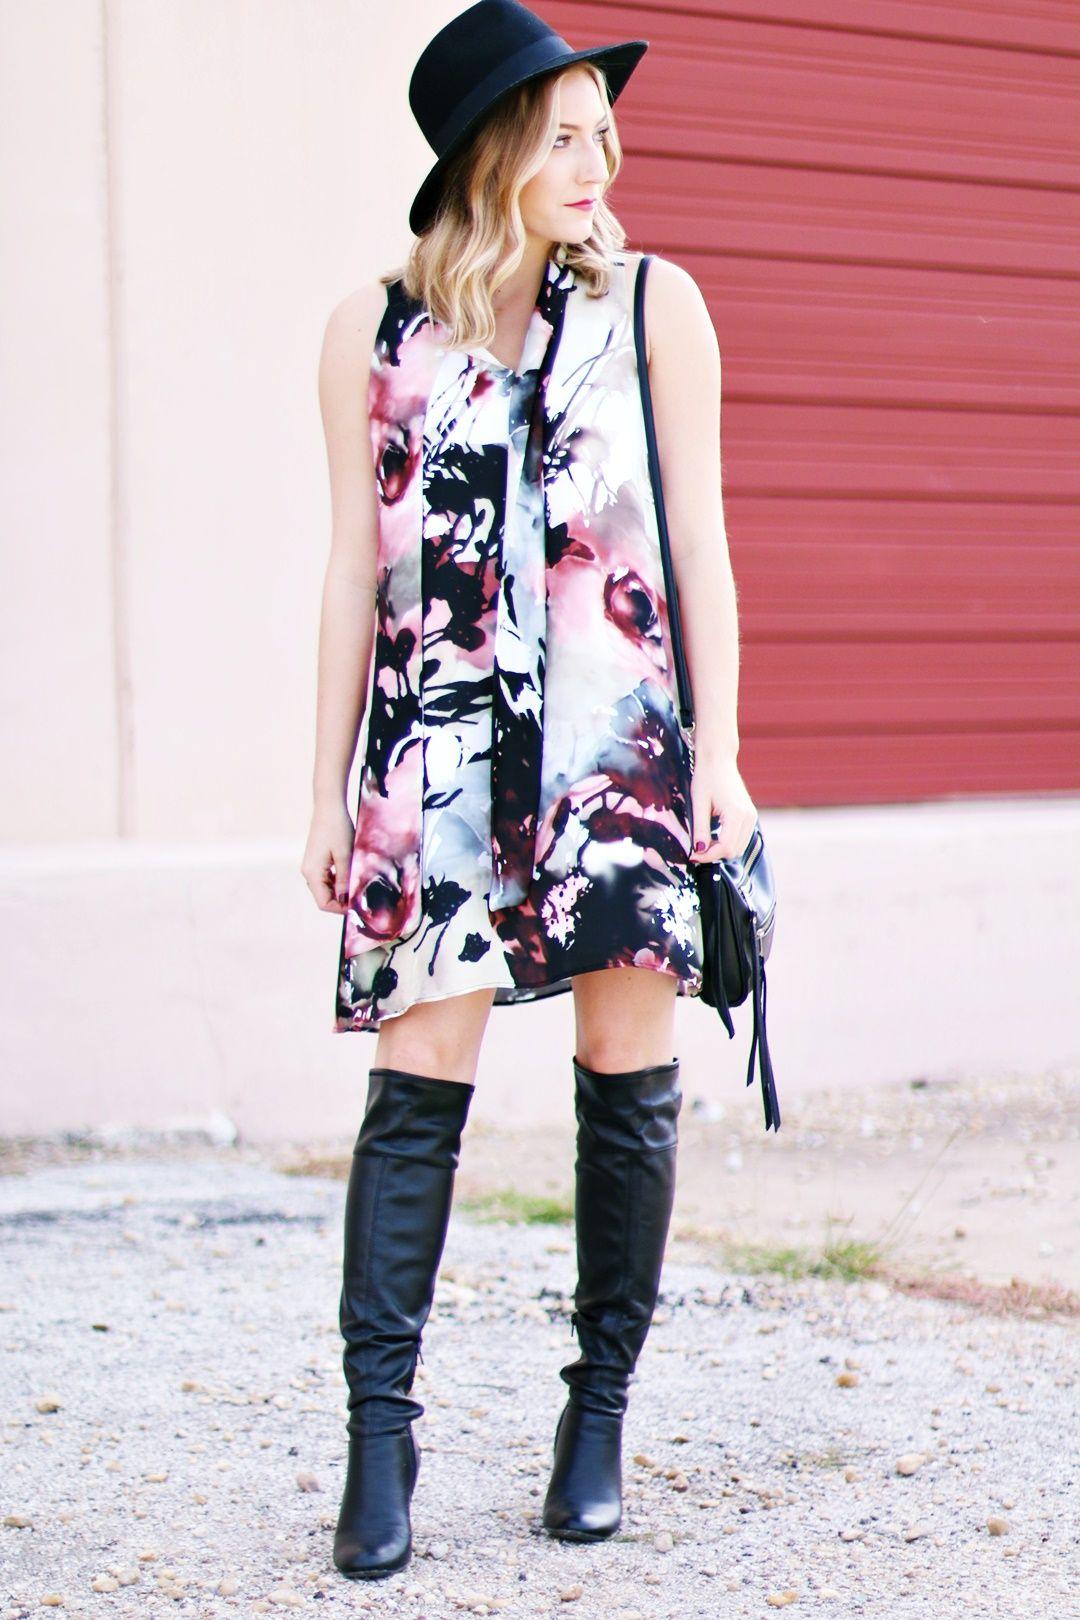 Askari Shayla Fall Bloom Dress - TheAshleyEdit